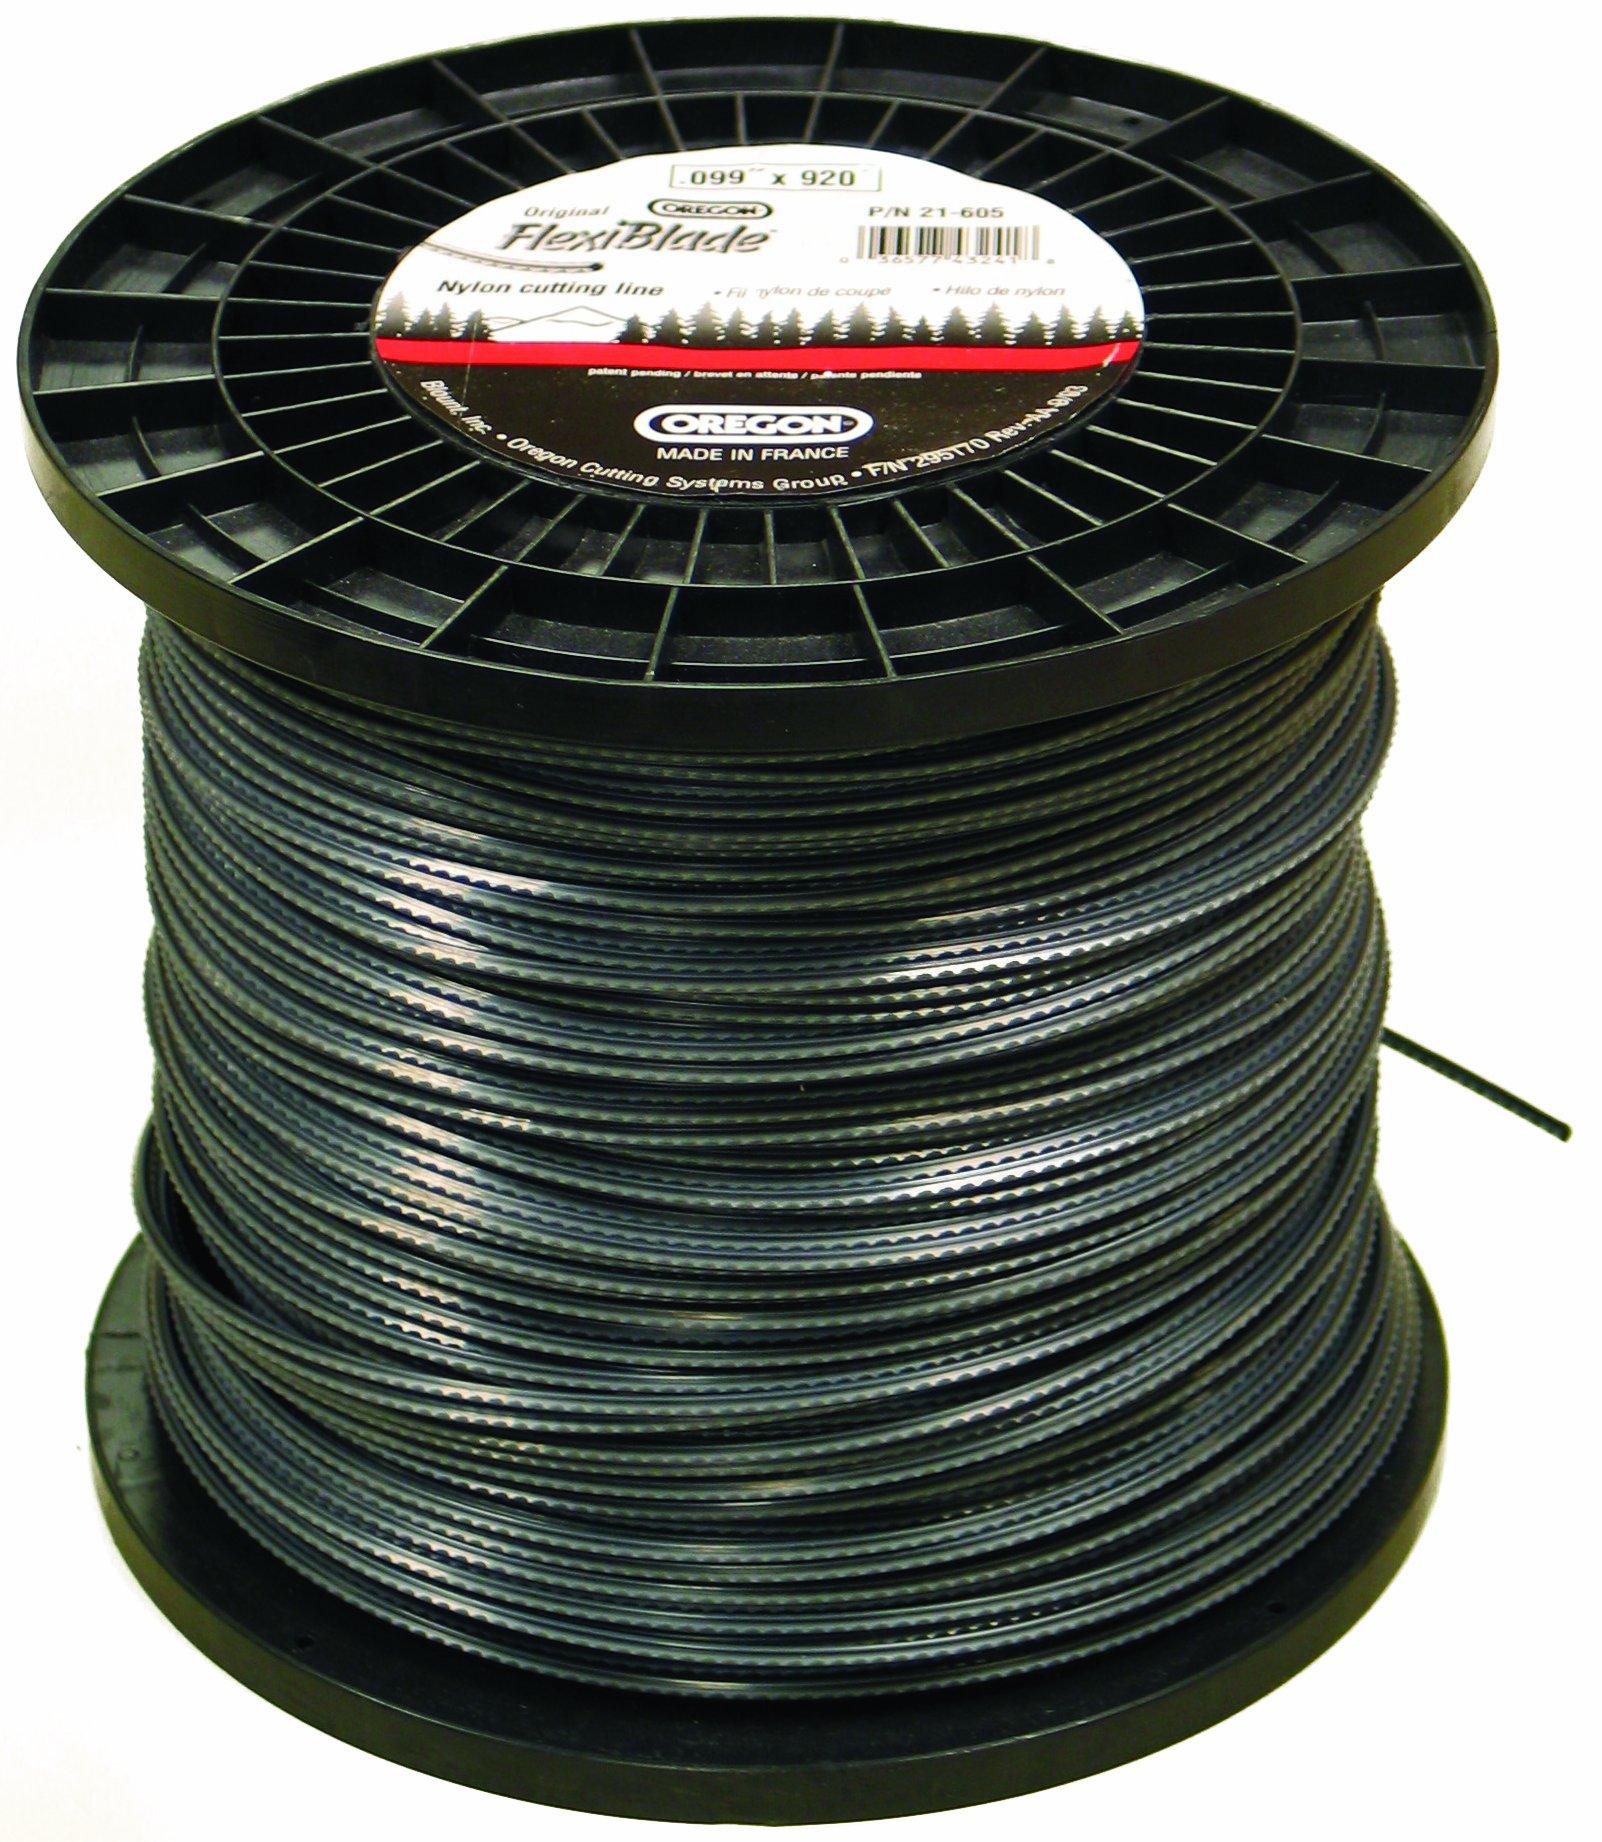 Oregon 21-605 FlexiBlade 920-Feet Large Spool of String Trimmer Line 0.099-Inch Gauge